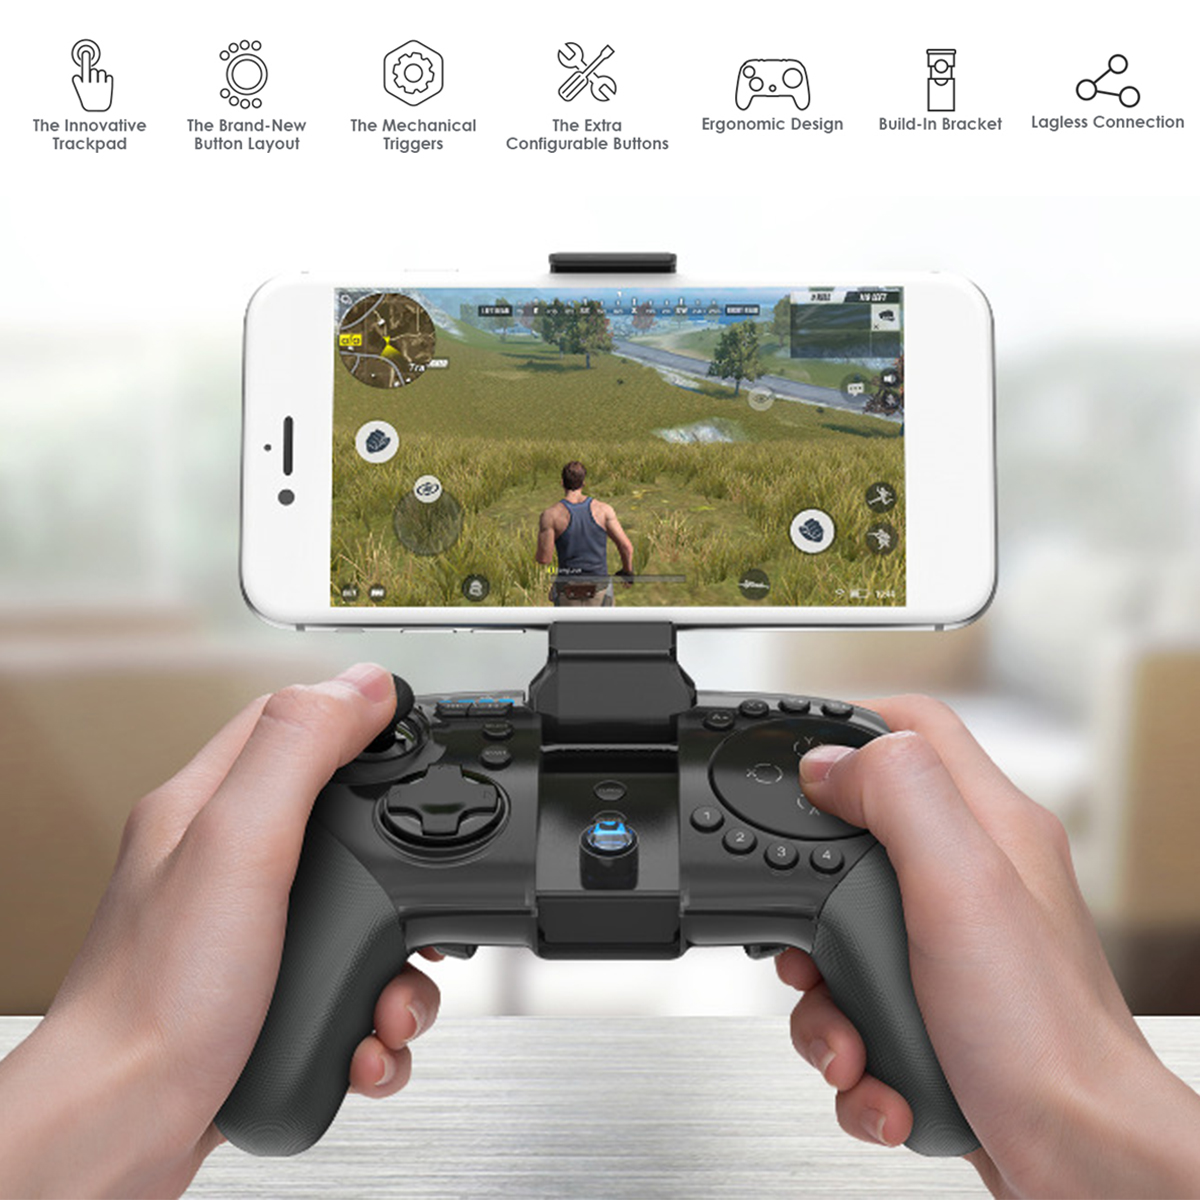 3Pcs Gamesir G5 Bluetooth Wireless Trackpad Touchpad Gamepad Mouse Keyboard  Converter